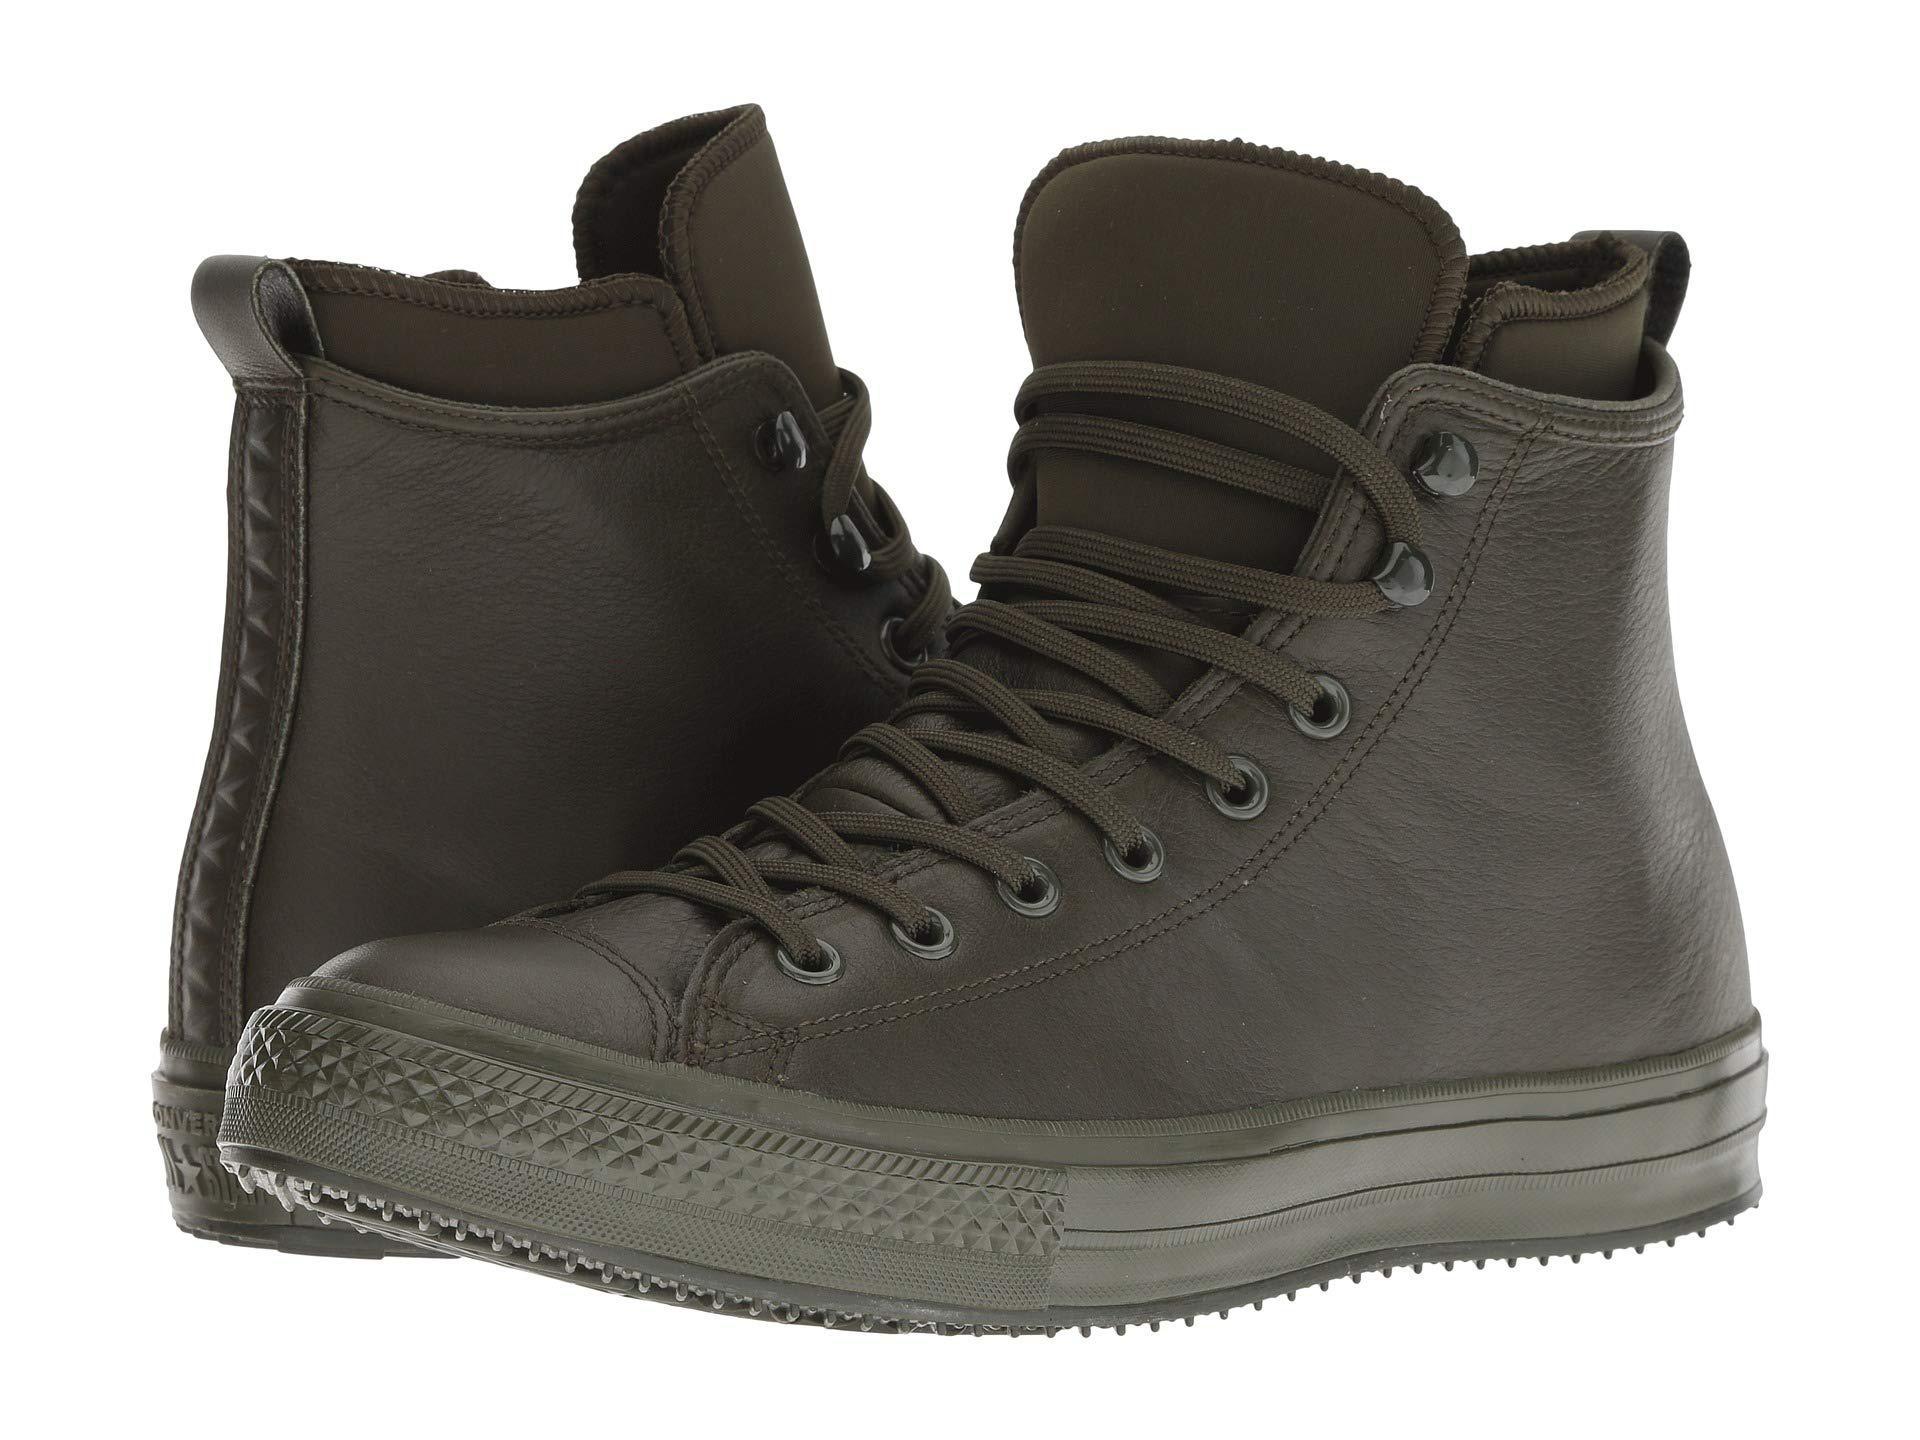 08810cfeeb7 Lyst - Converse Chuck Taylor All Star Waterproof Boot - Hi (utility ...